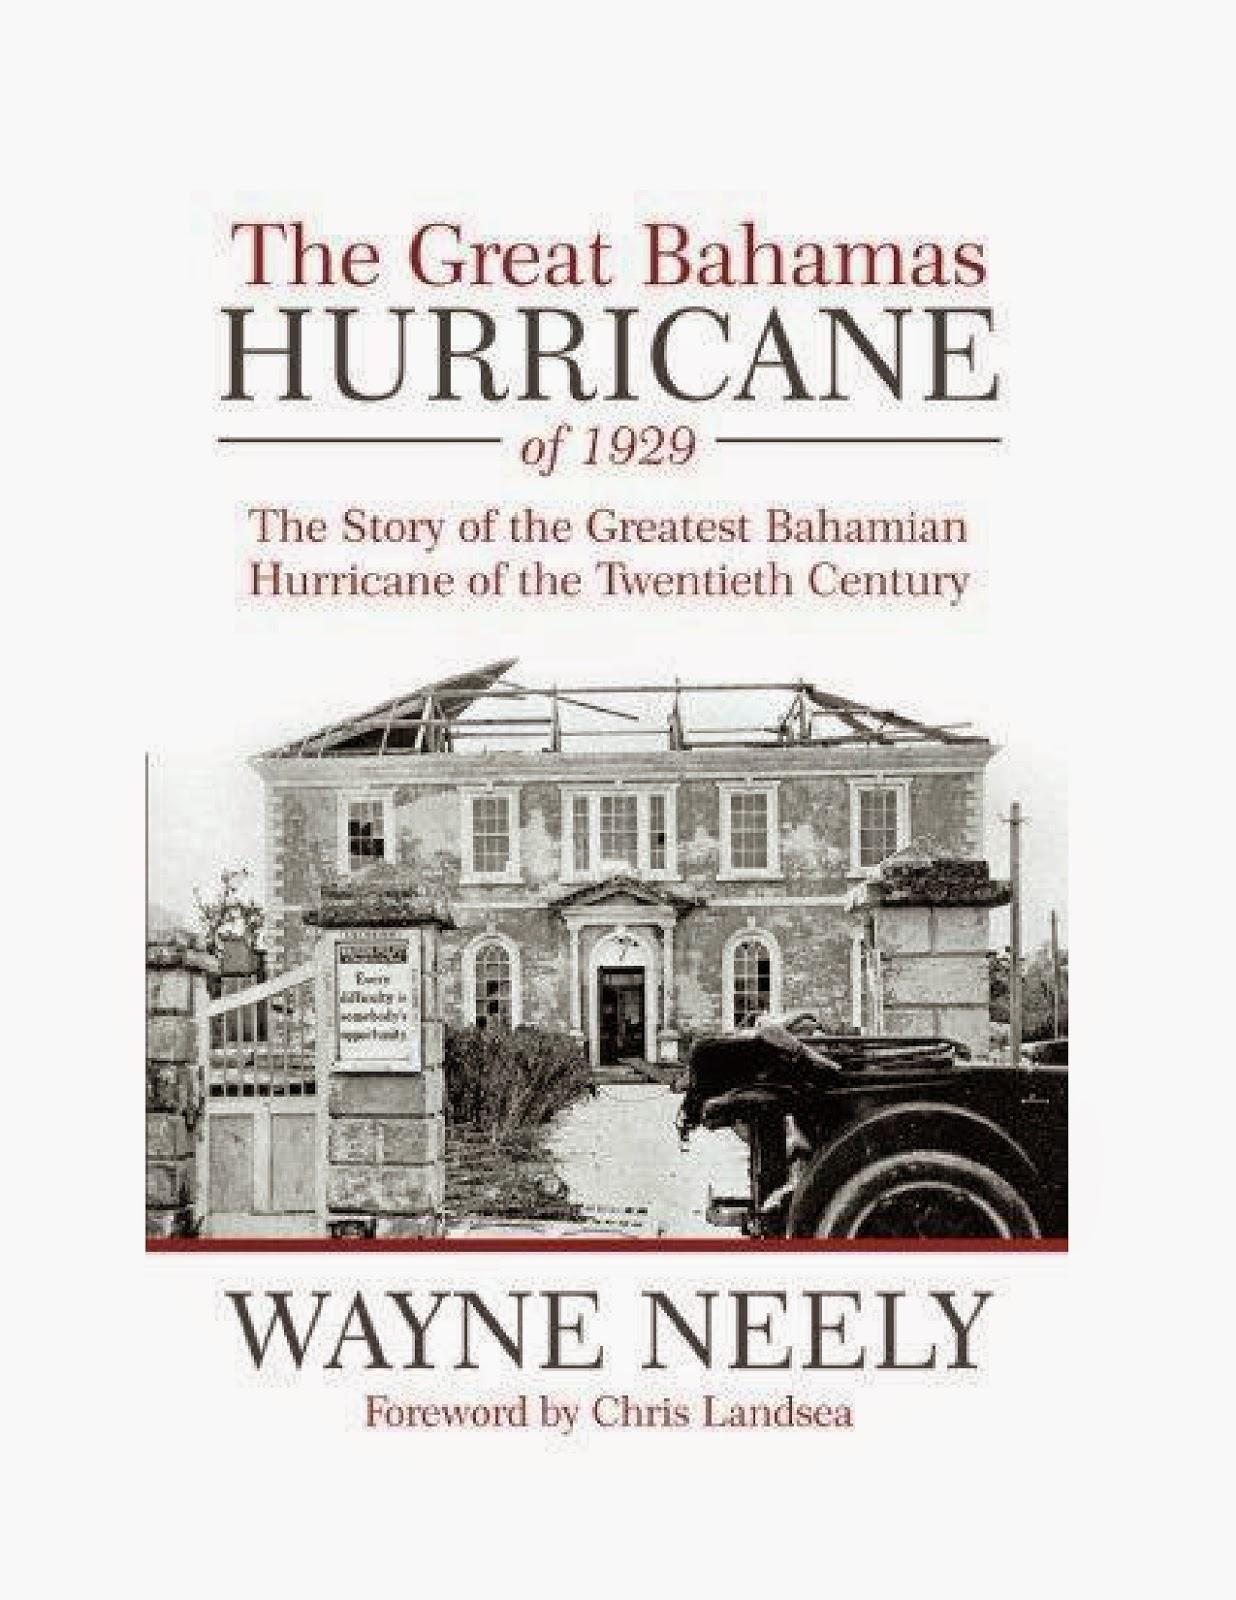 http://www.amazon.com/Great-Bahamas-Hurricane-1929-Twentieth-ebook/dp/B00HF0JT1O/ref=la_B001JS19W0_1_2?s=books&ie=UTF8&qid=1408989519&sr=1-2